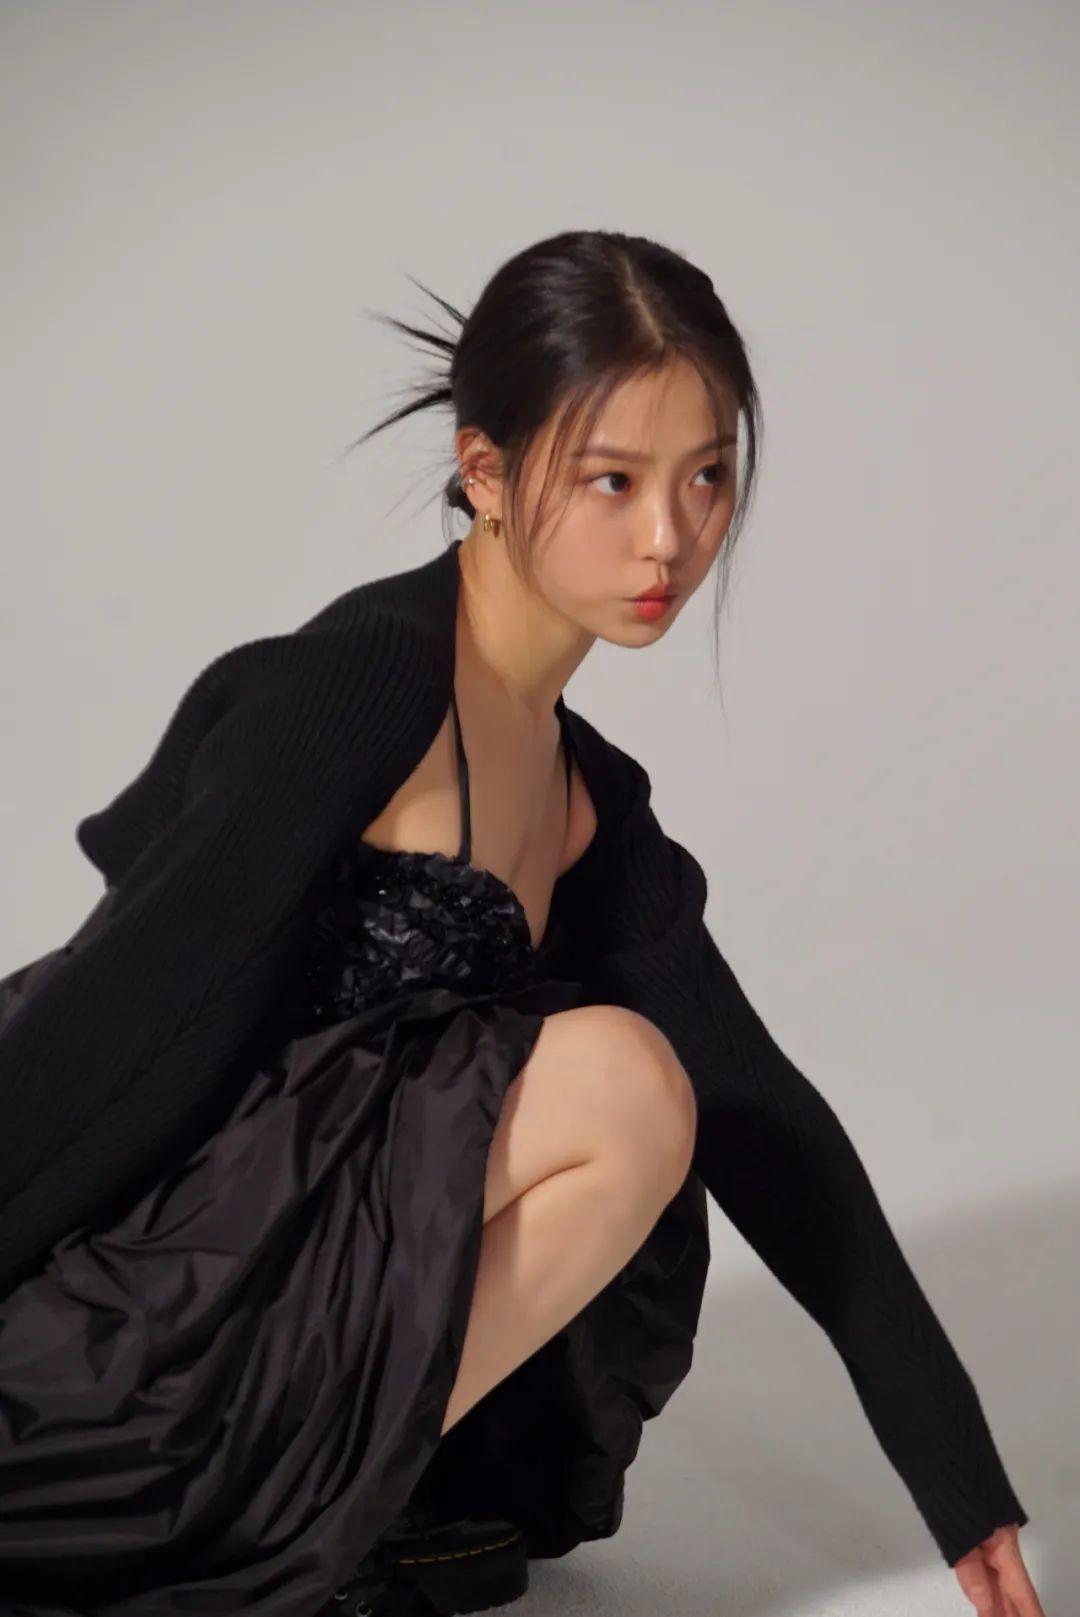 Face bump Kim min hee Korean drama atmosphere beauty + 1插图38